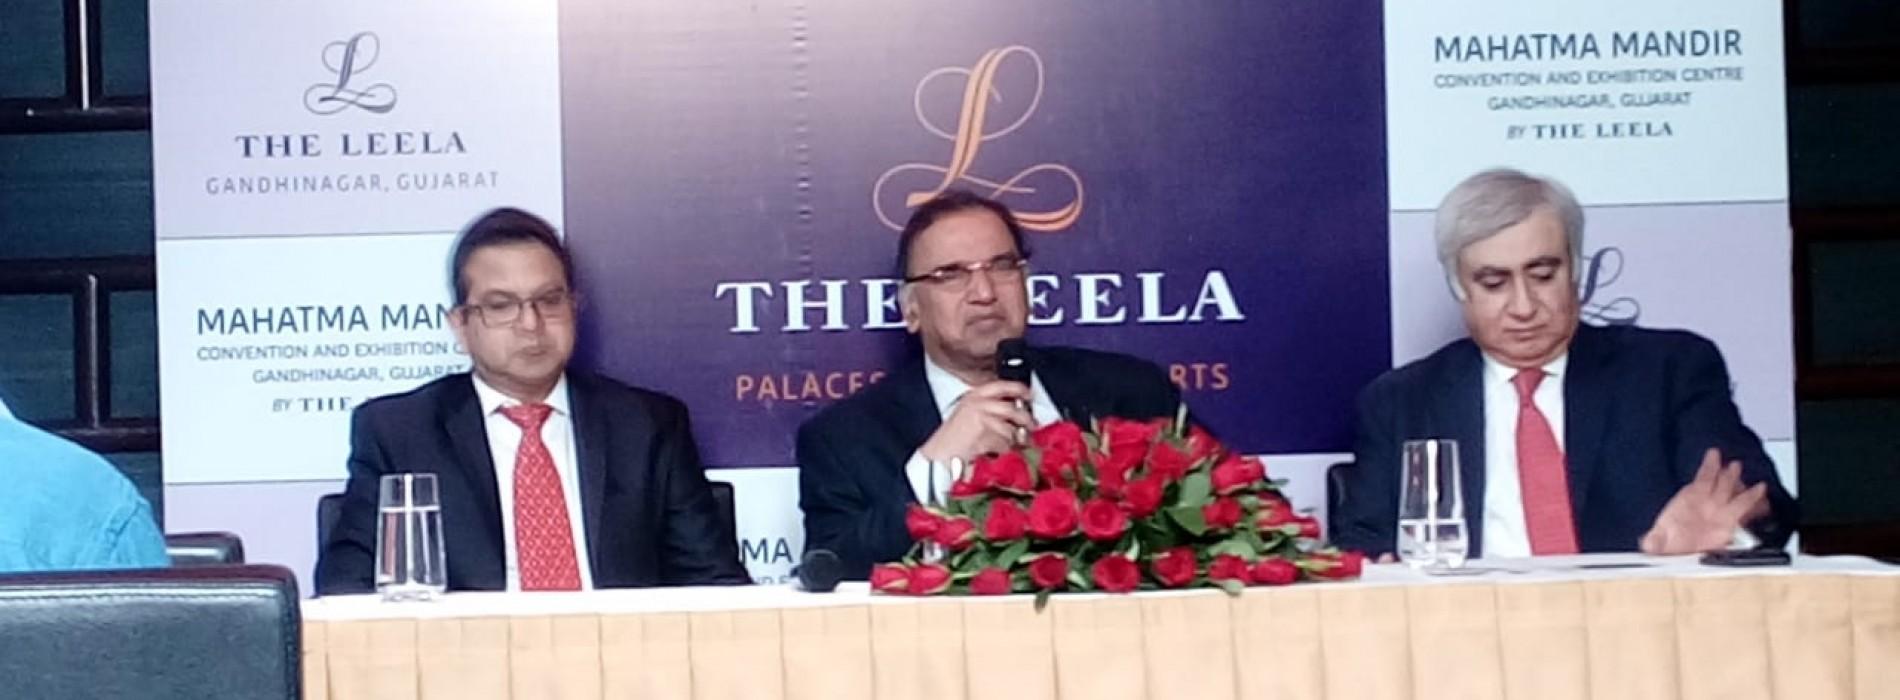 The Leela wins contract to manage Mahatma Mandir